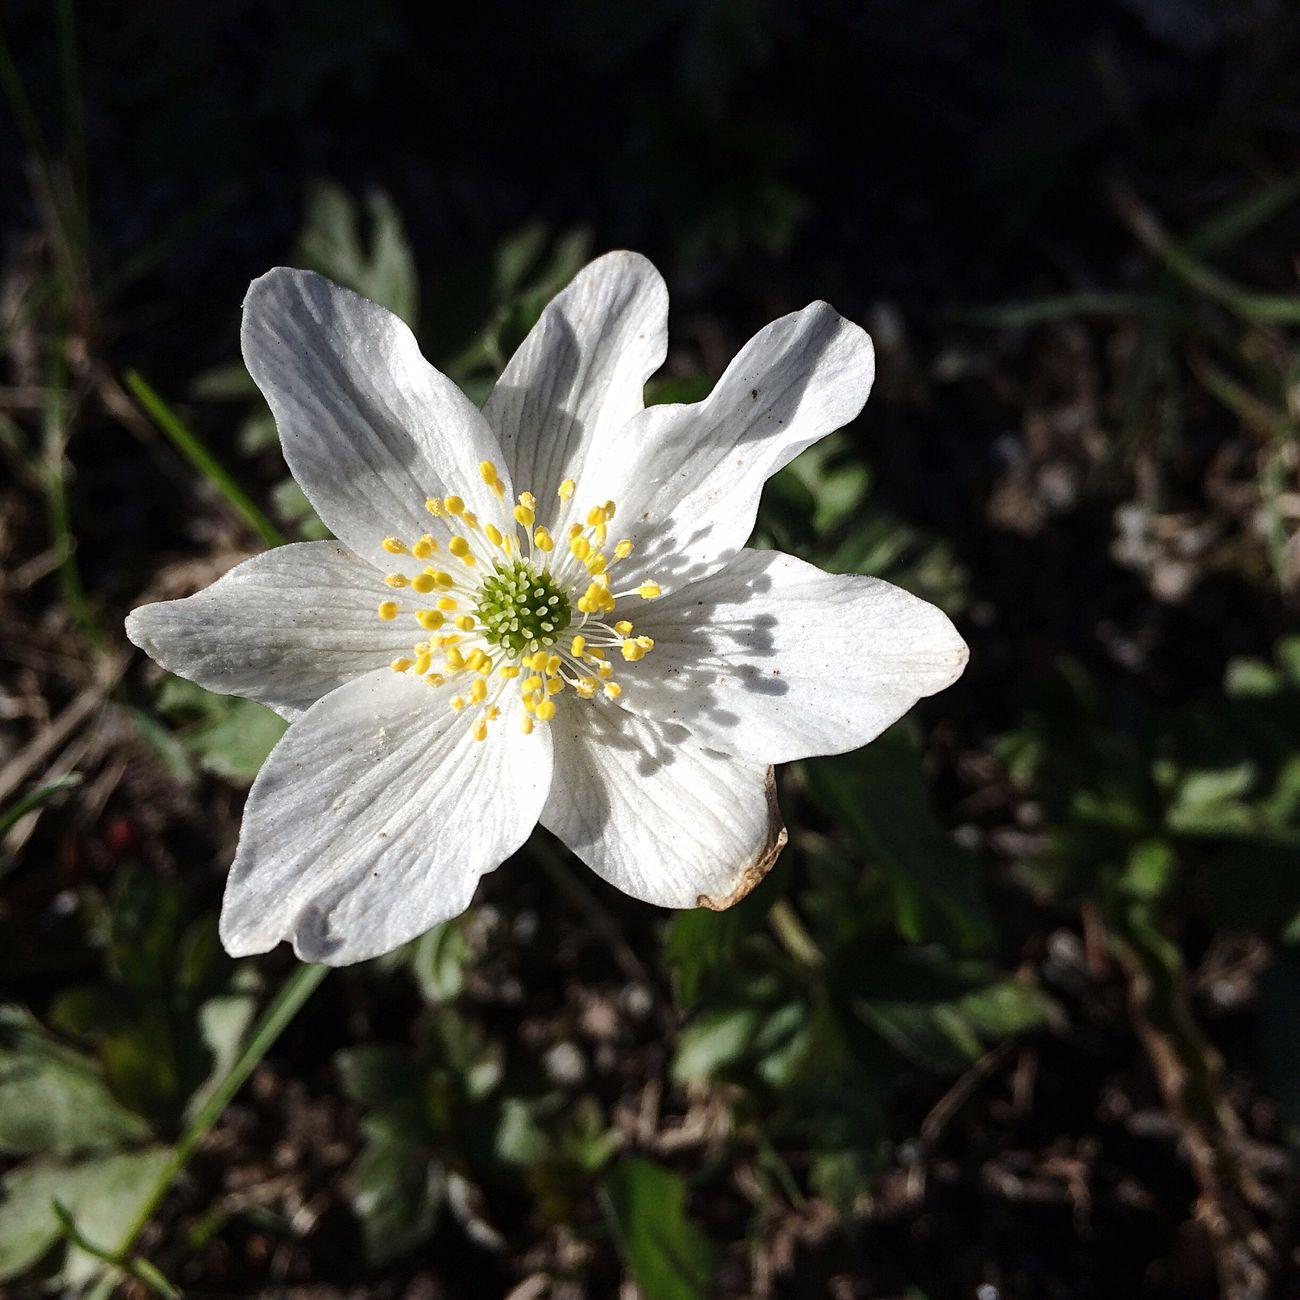 White Anemone Anemone Nemorosa Wood Anemone Spring Spring Flowers Nature Photography Nature Naturelovers